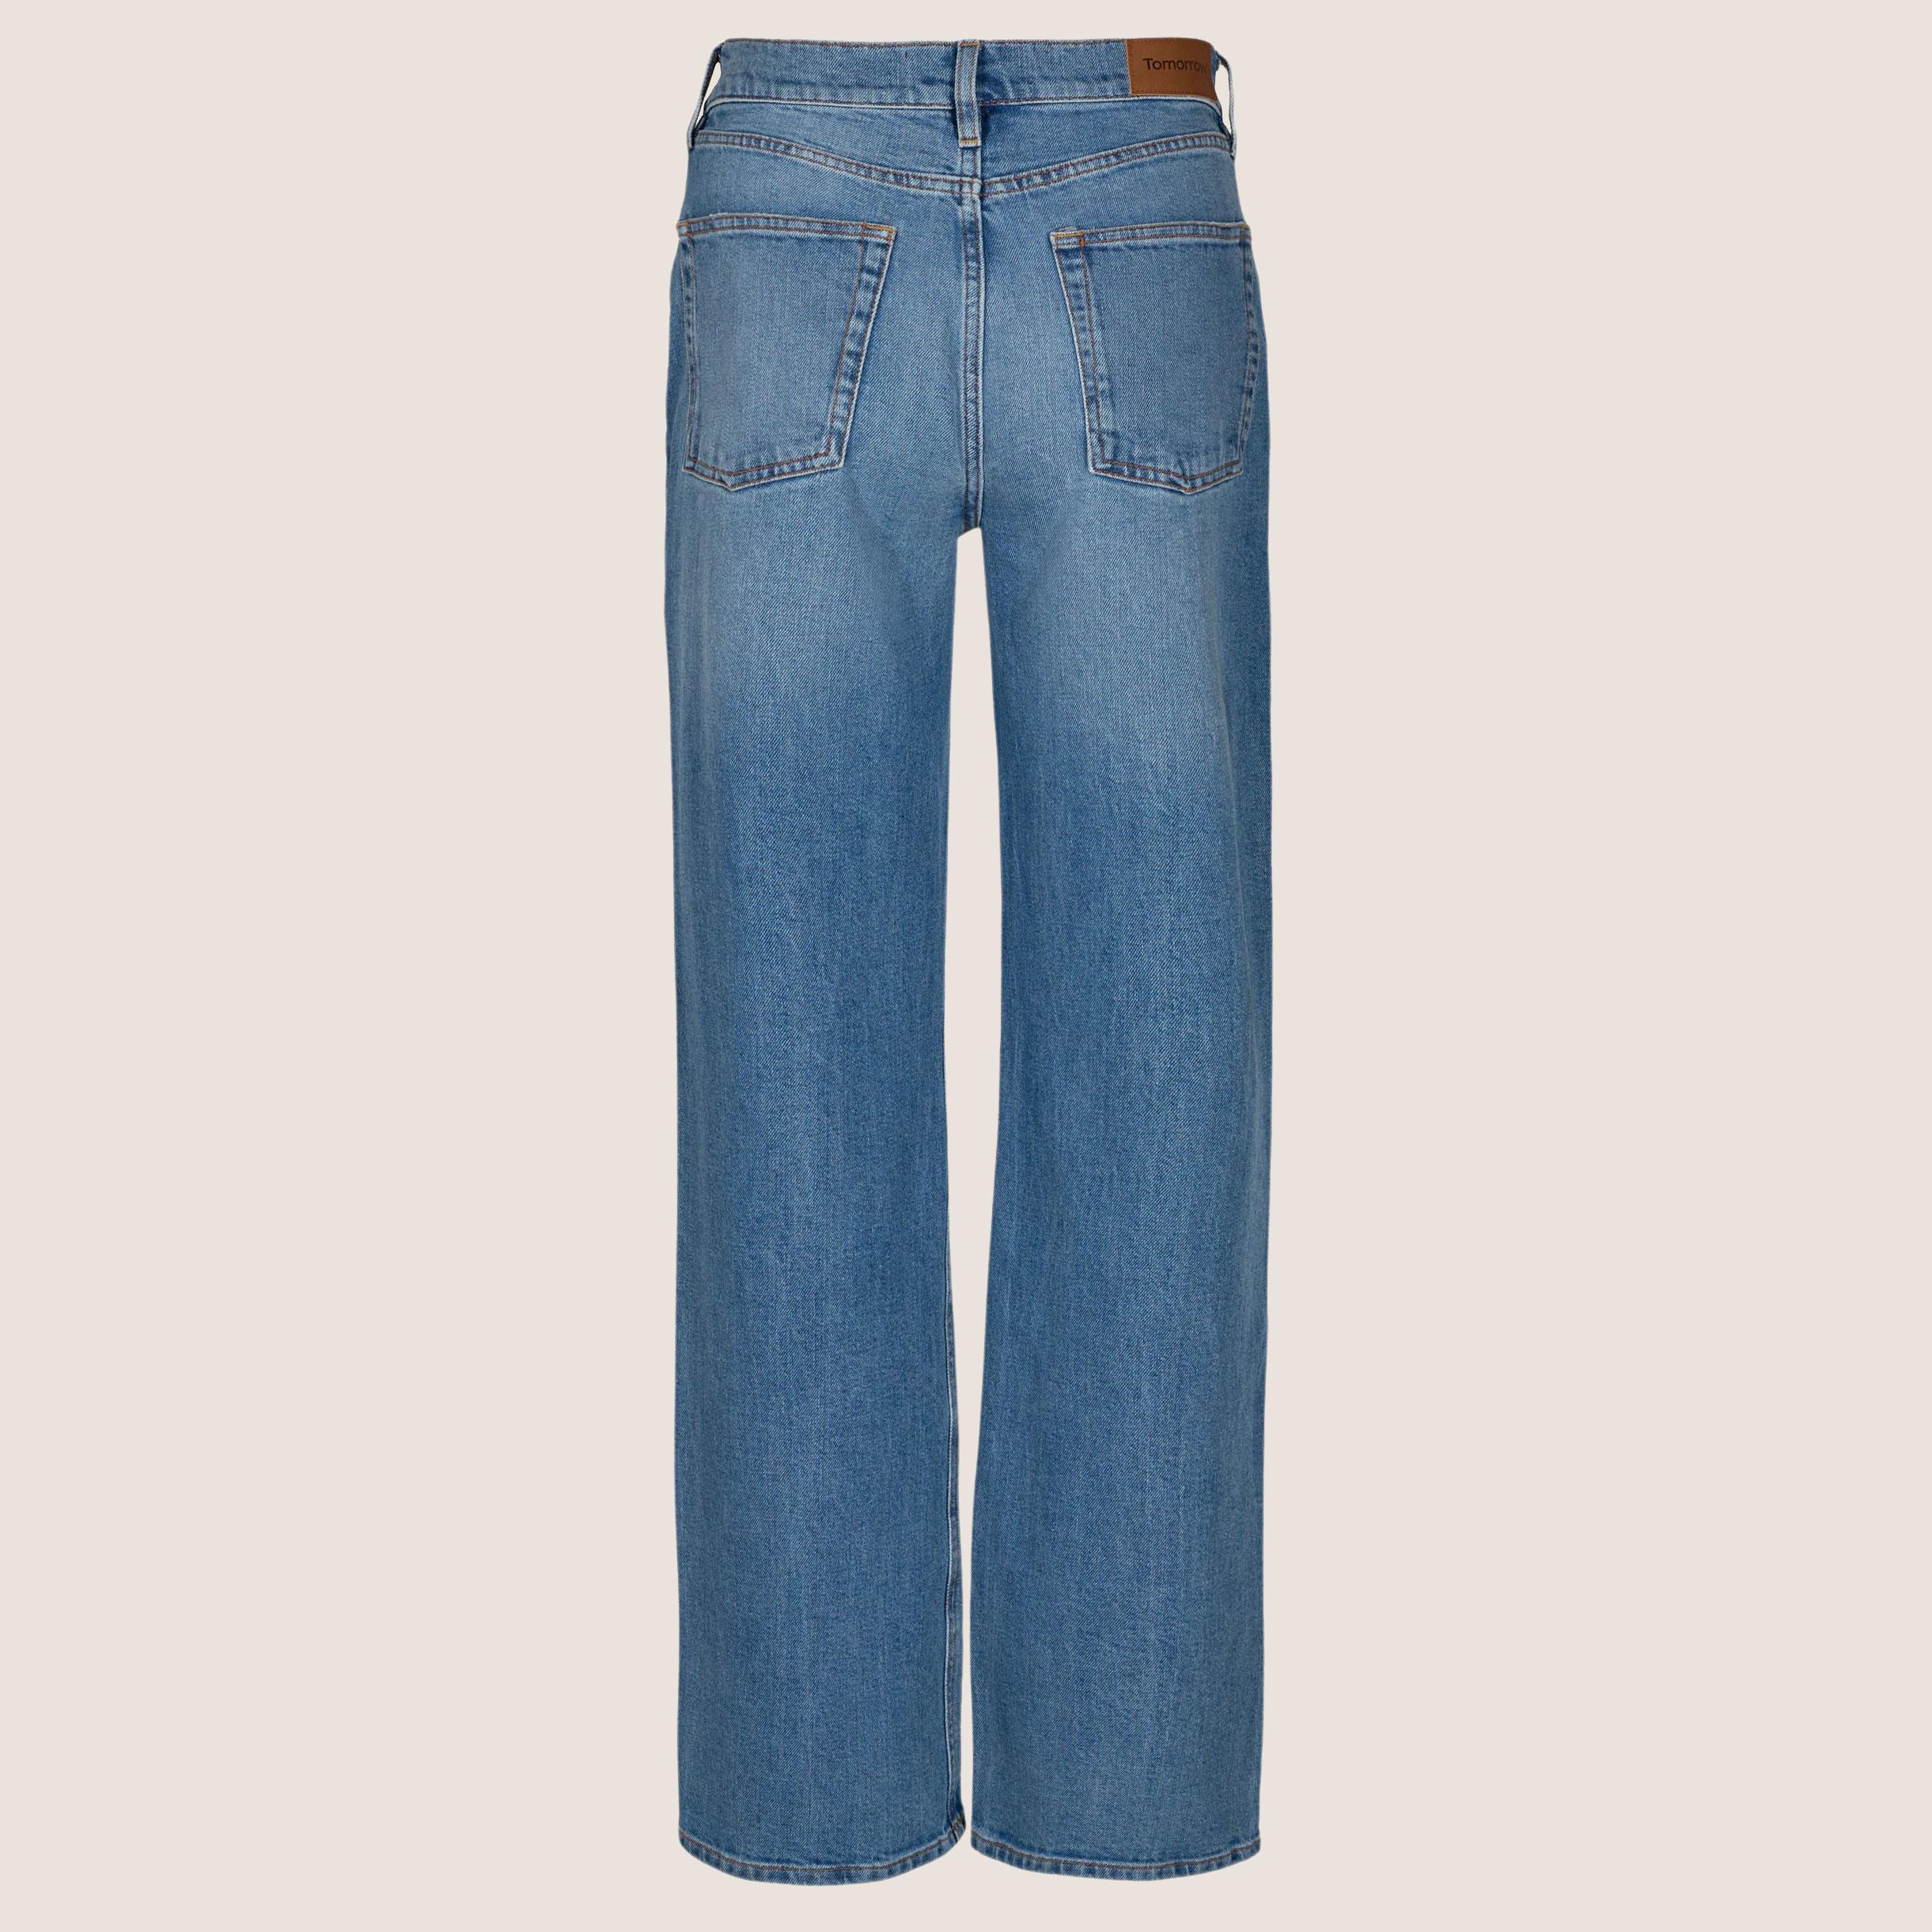 Brown Straight Jeans - Lowa